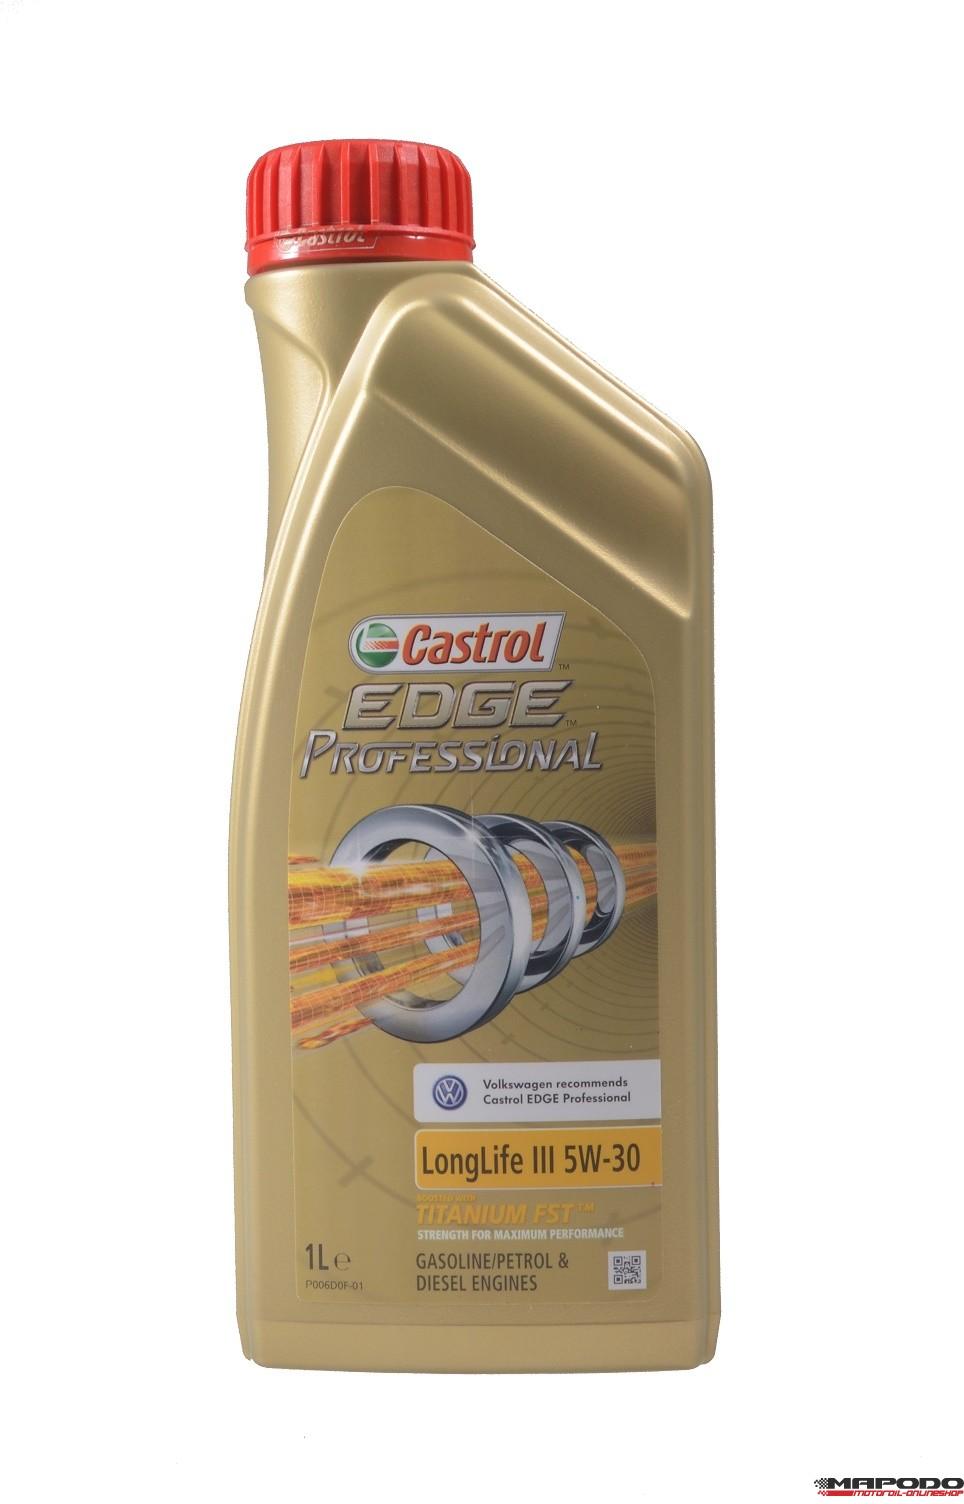 Castrol EDGE Professional LongLife 3, 5W-30 | 1 Ltr.